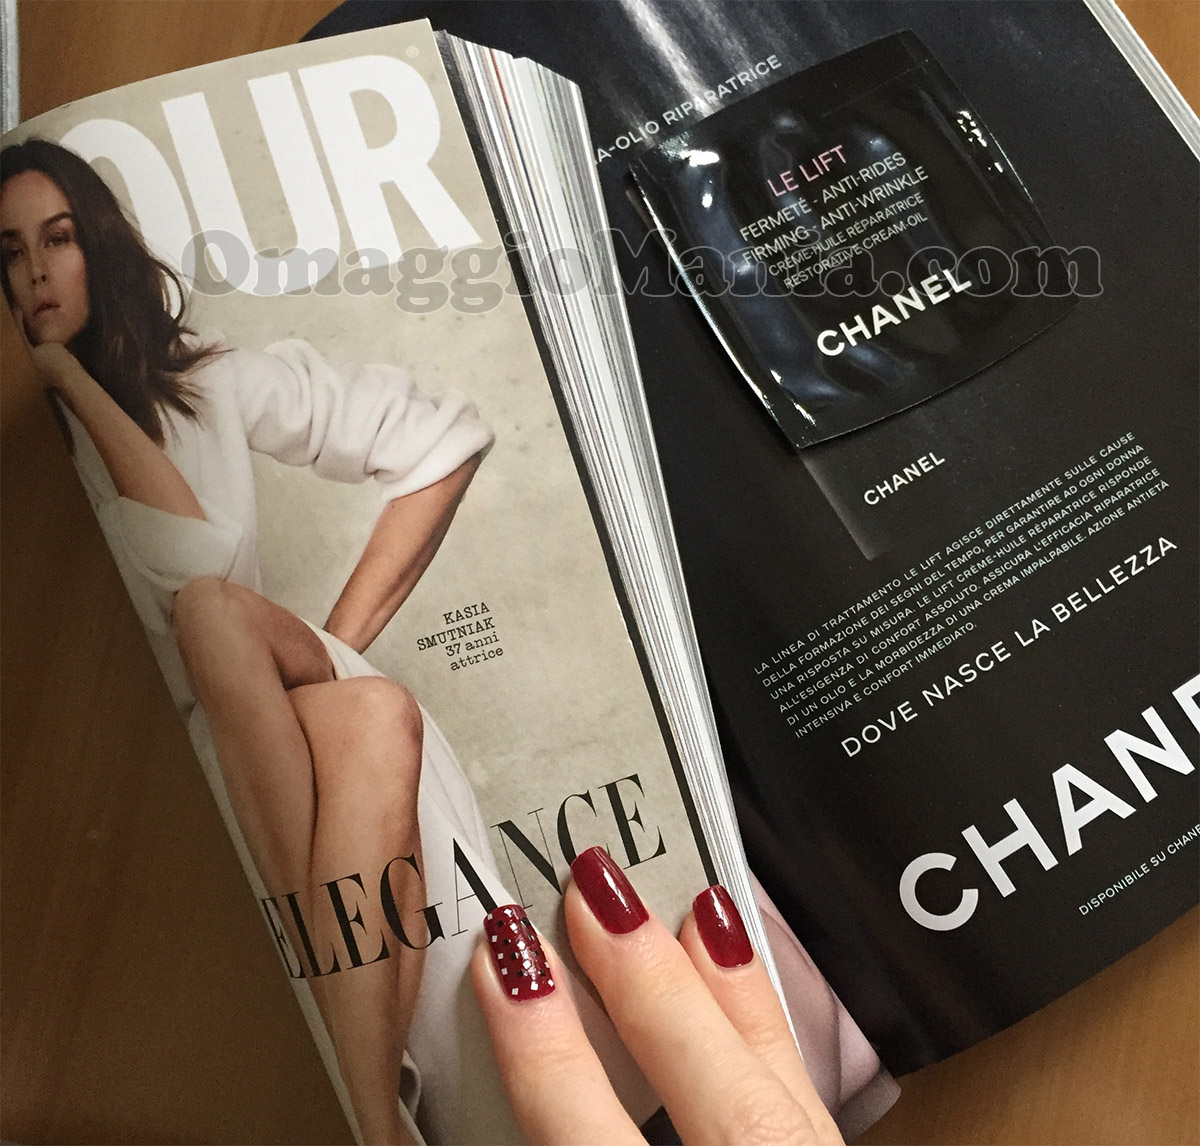 Glamour 293 e crema Le Lift Chanel di Turchina17